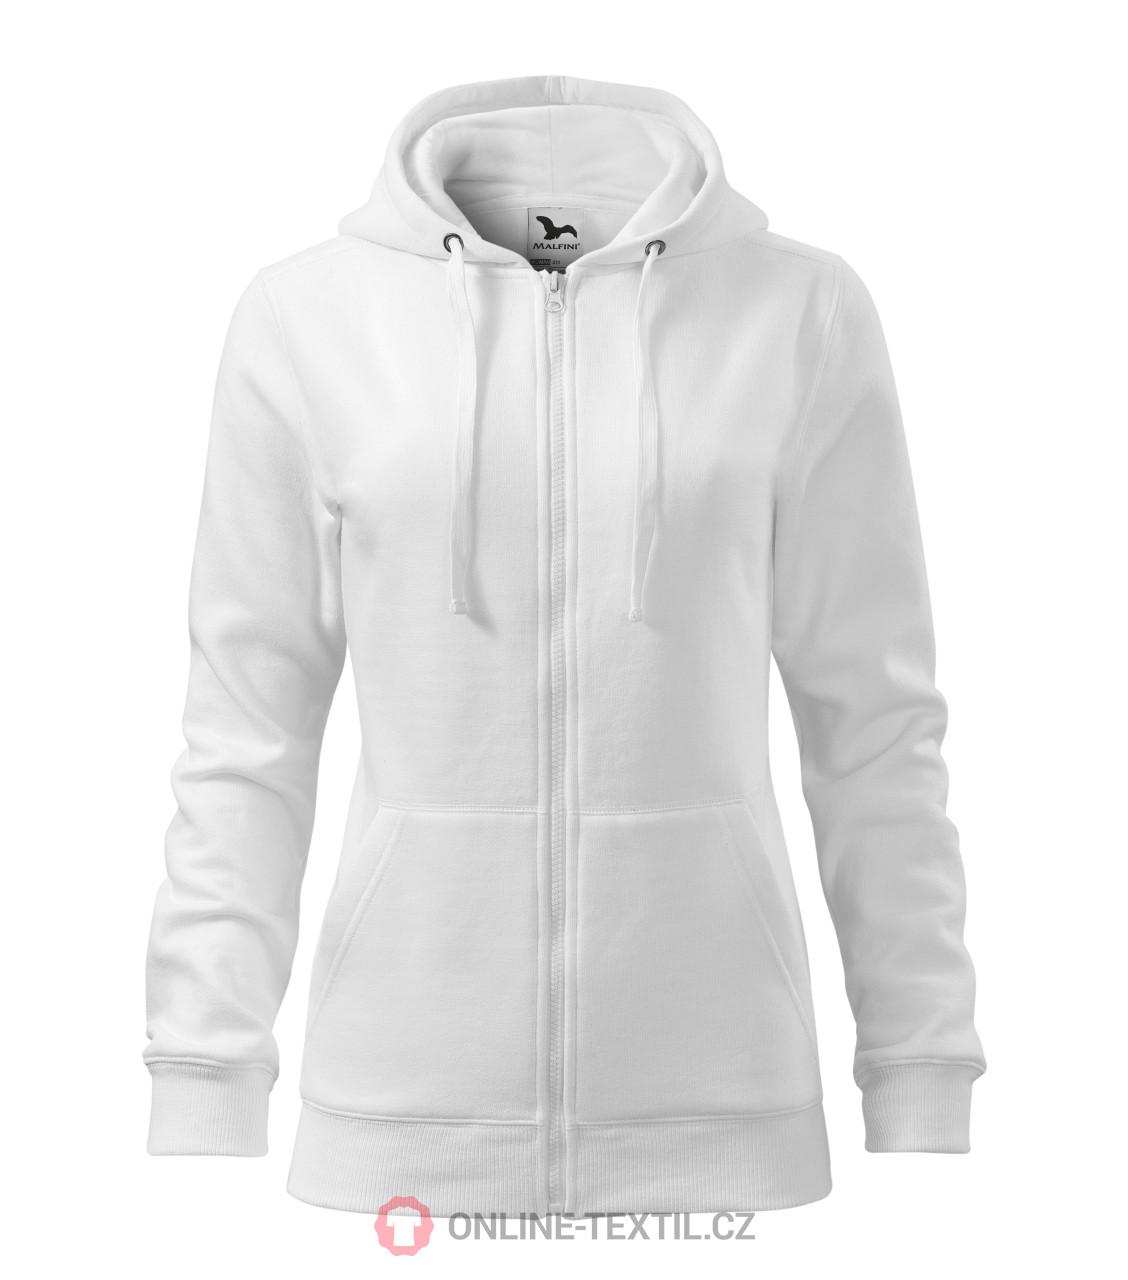 Ladies sweatshirt Trendy Zipper with hood ...